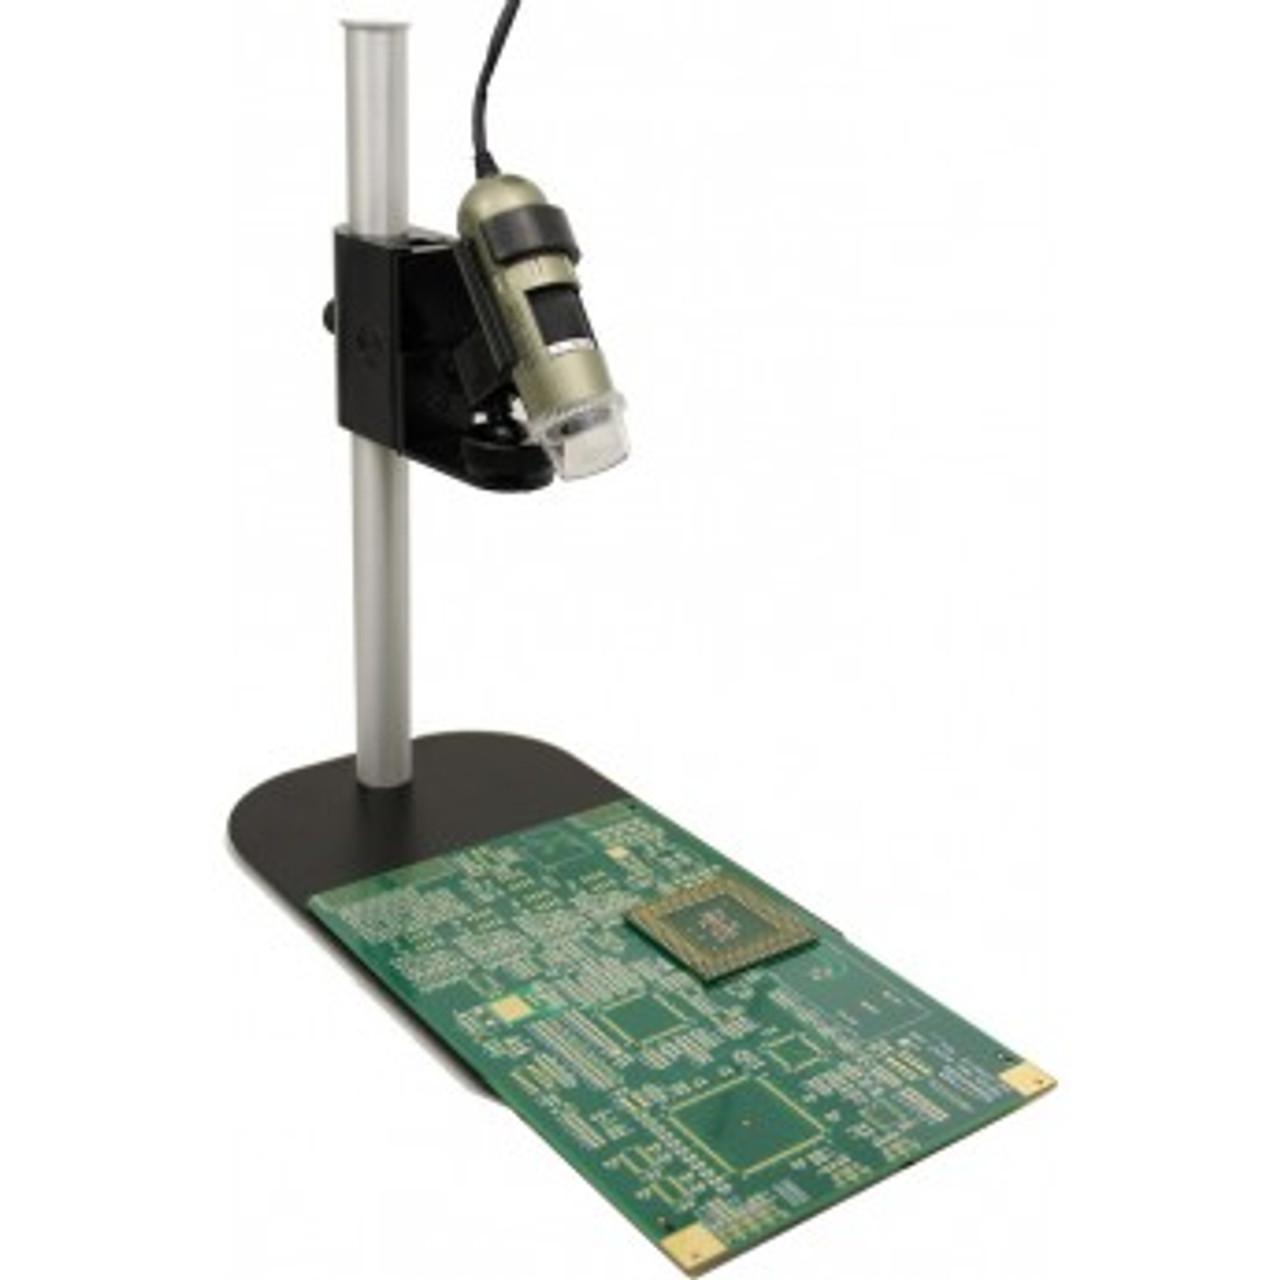 AM4113ZTL Dino-Lite - longer working distance, 10x-92x, 1.3MP, polarizer